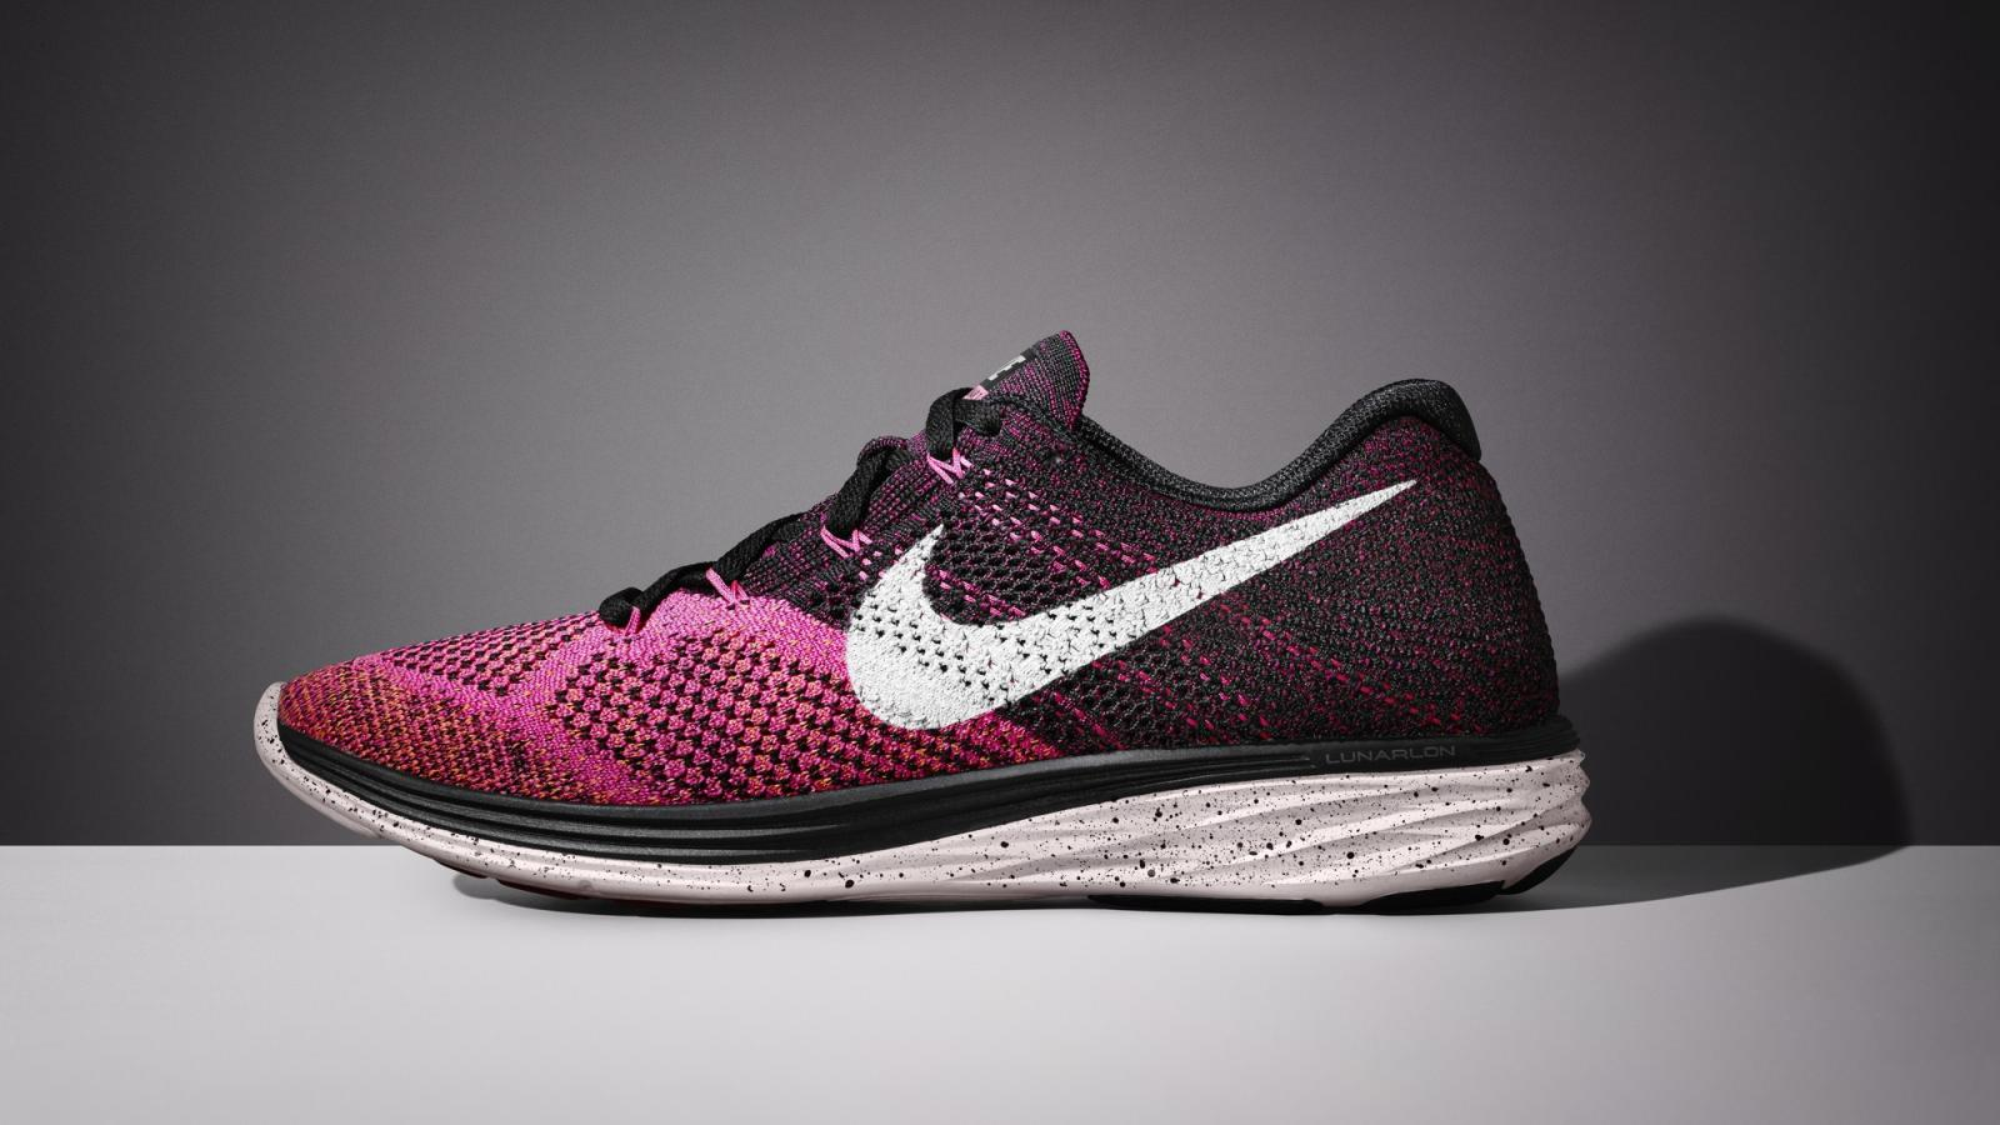 engranaje Más grande puesto  Nike's COO thinks we could soon 3D print Nike sneakers at home — Quartz